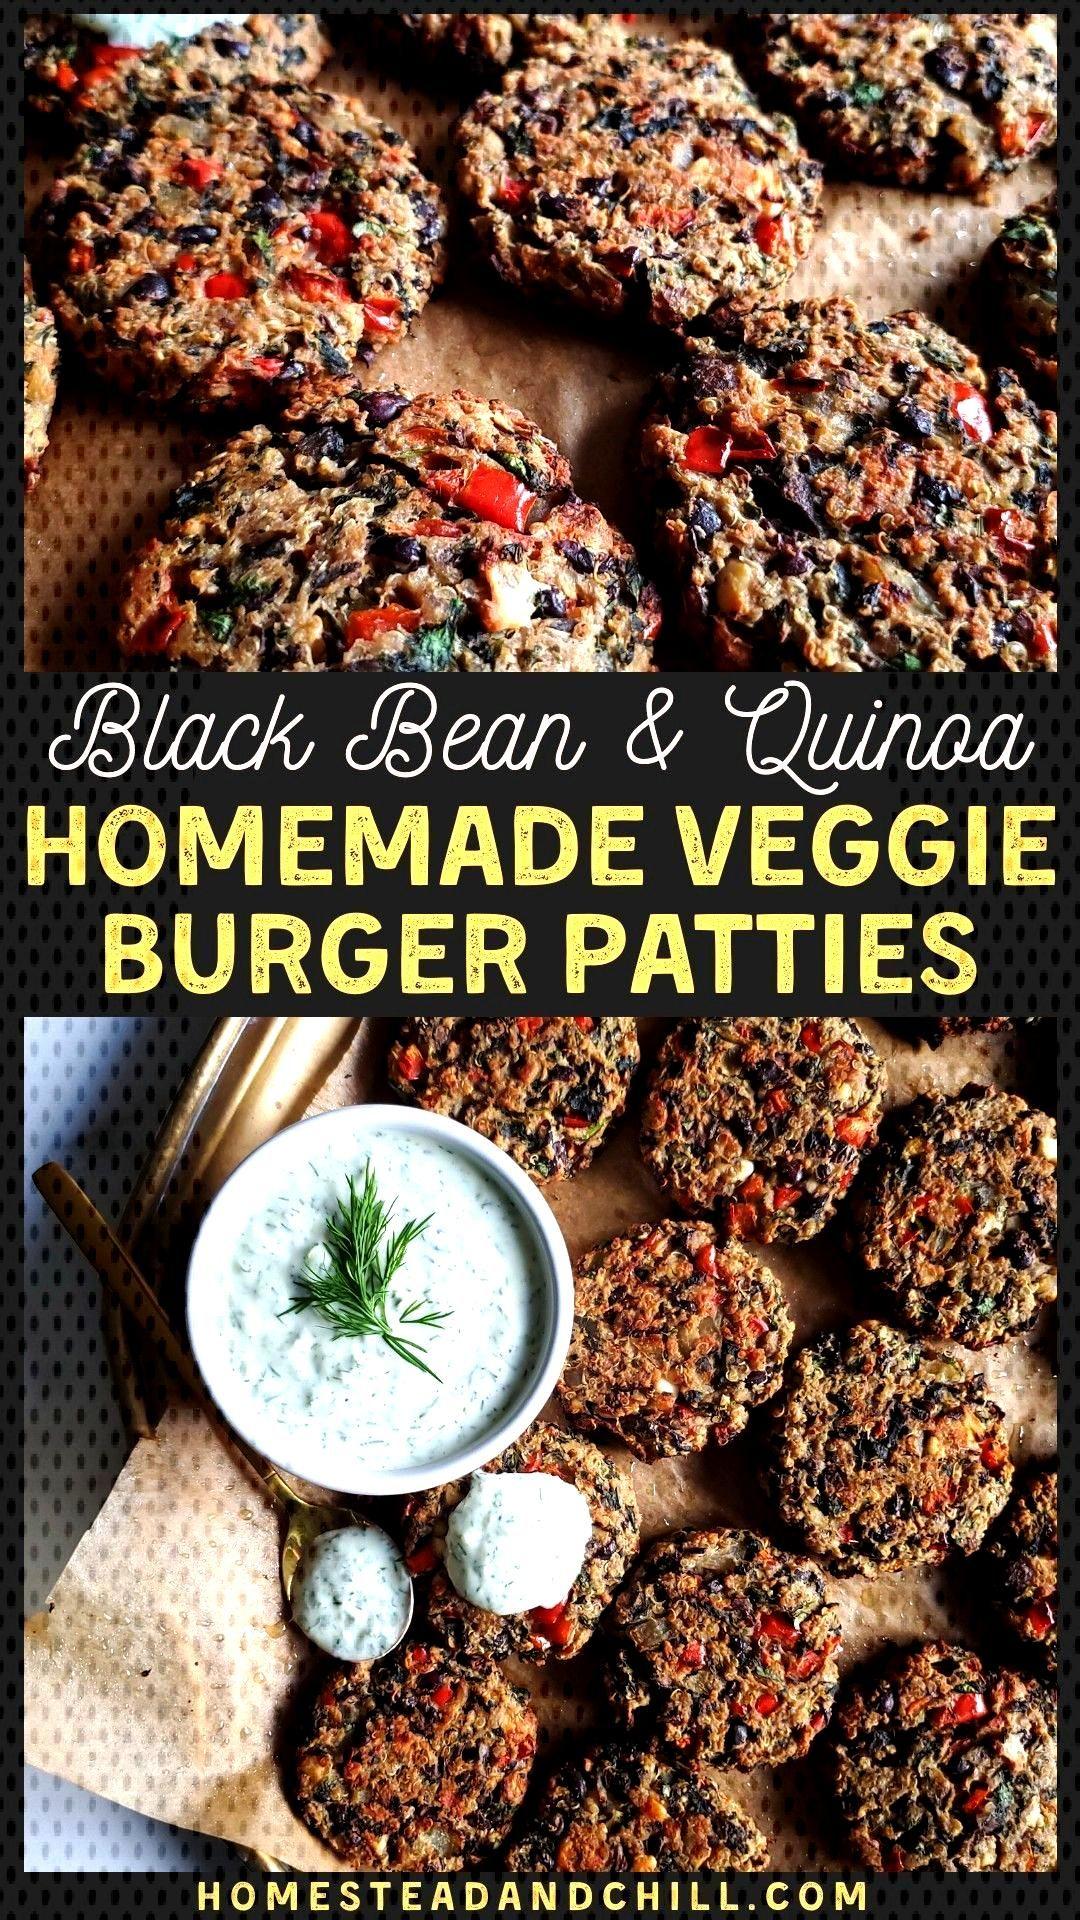 Black Bean amp Quinoa Homemade Veggie Burger Patties ~ Homestead and Chill - Black Bean amp Quinoa Hom